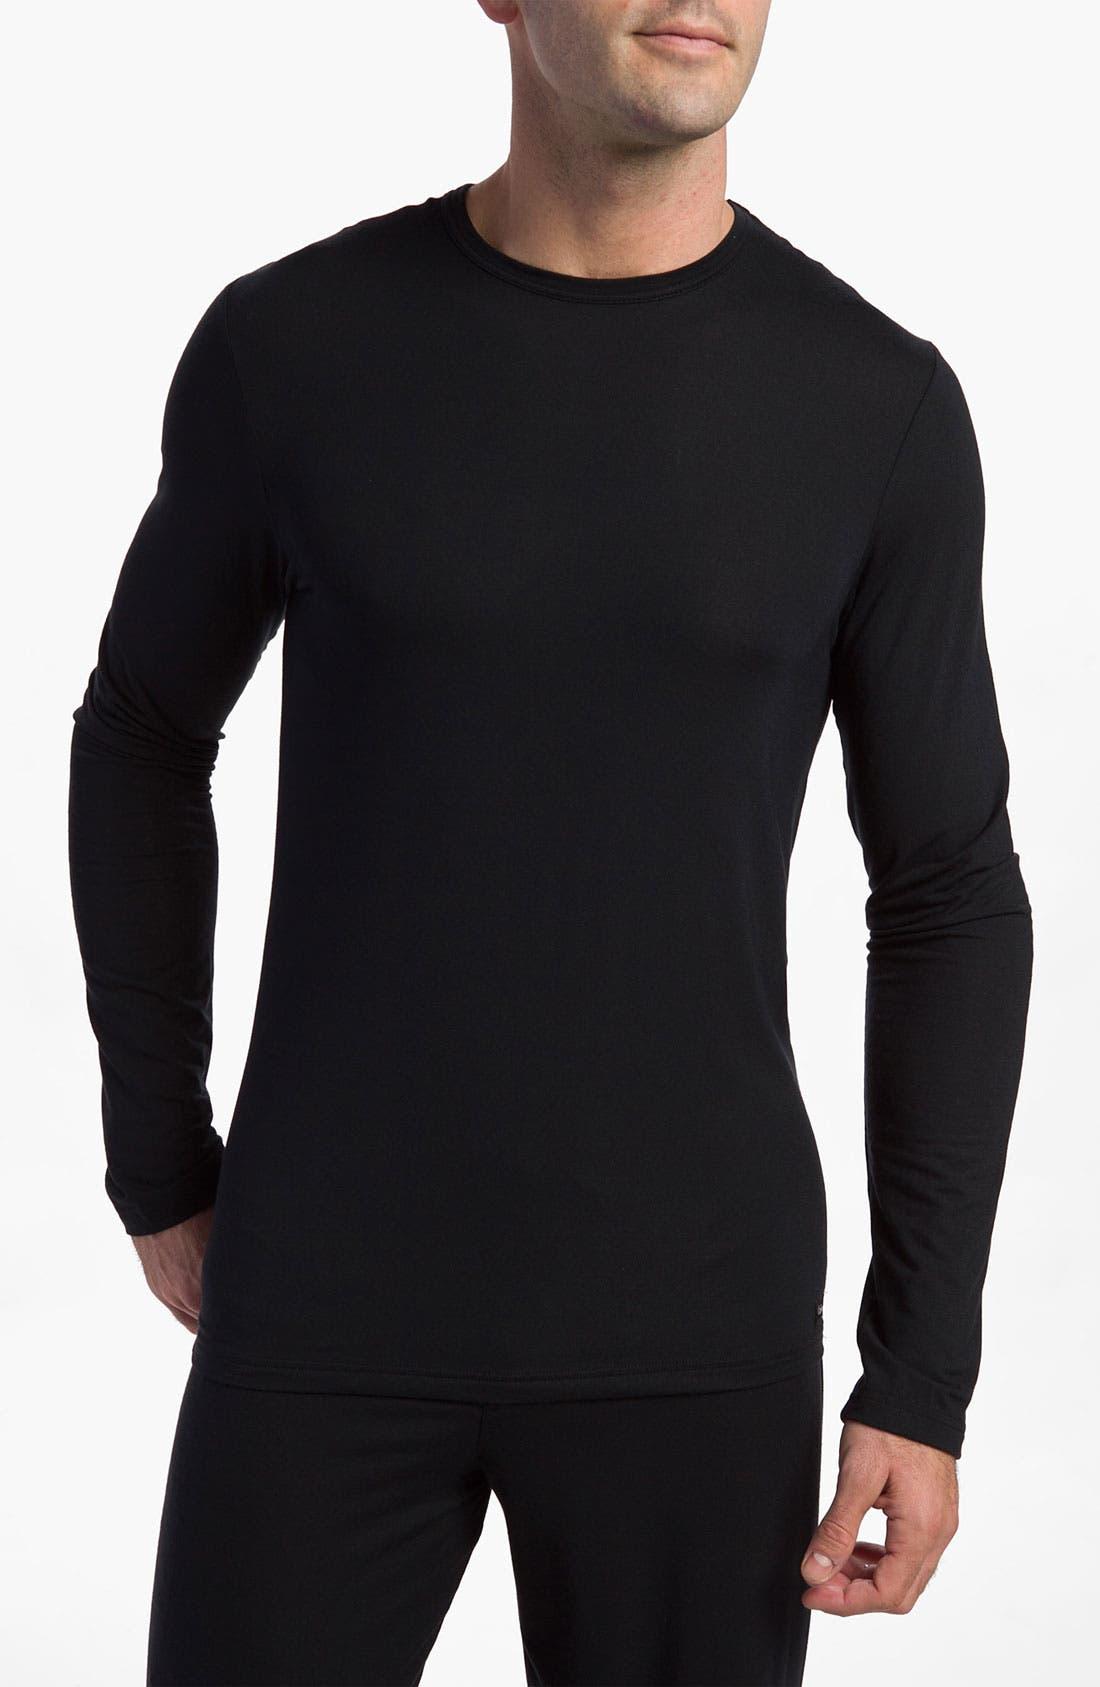 Calvin Klein 'U1139' Micromodal Long Sleeve T-Shirt